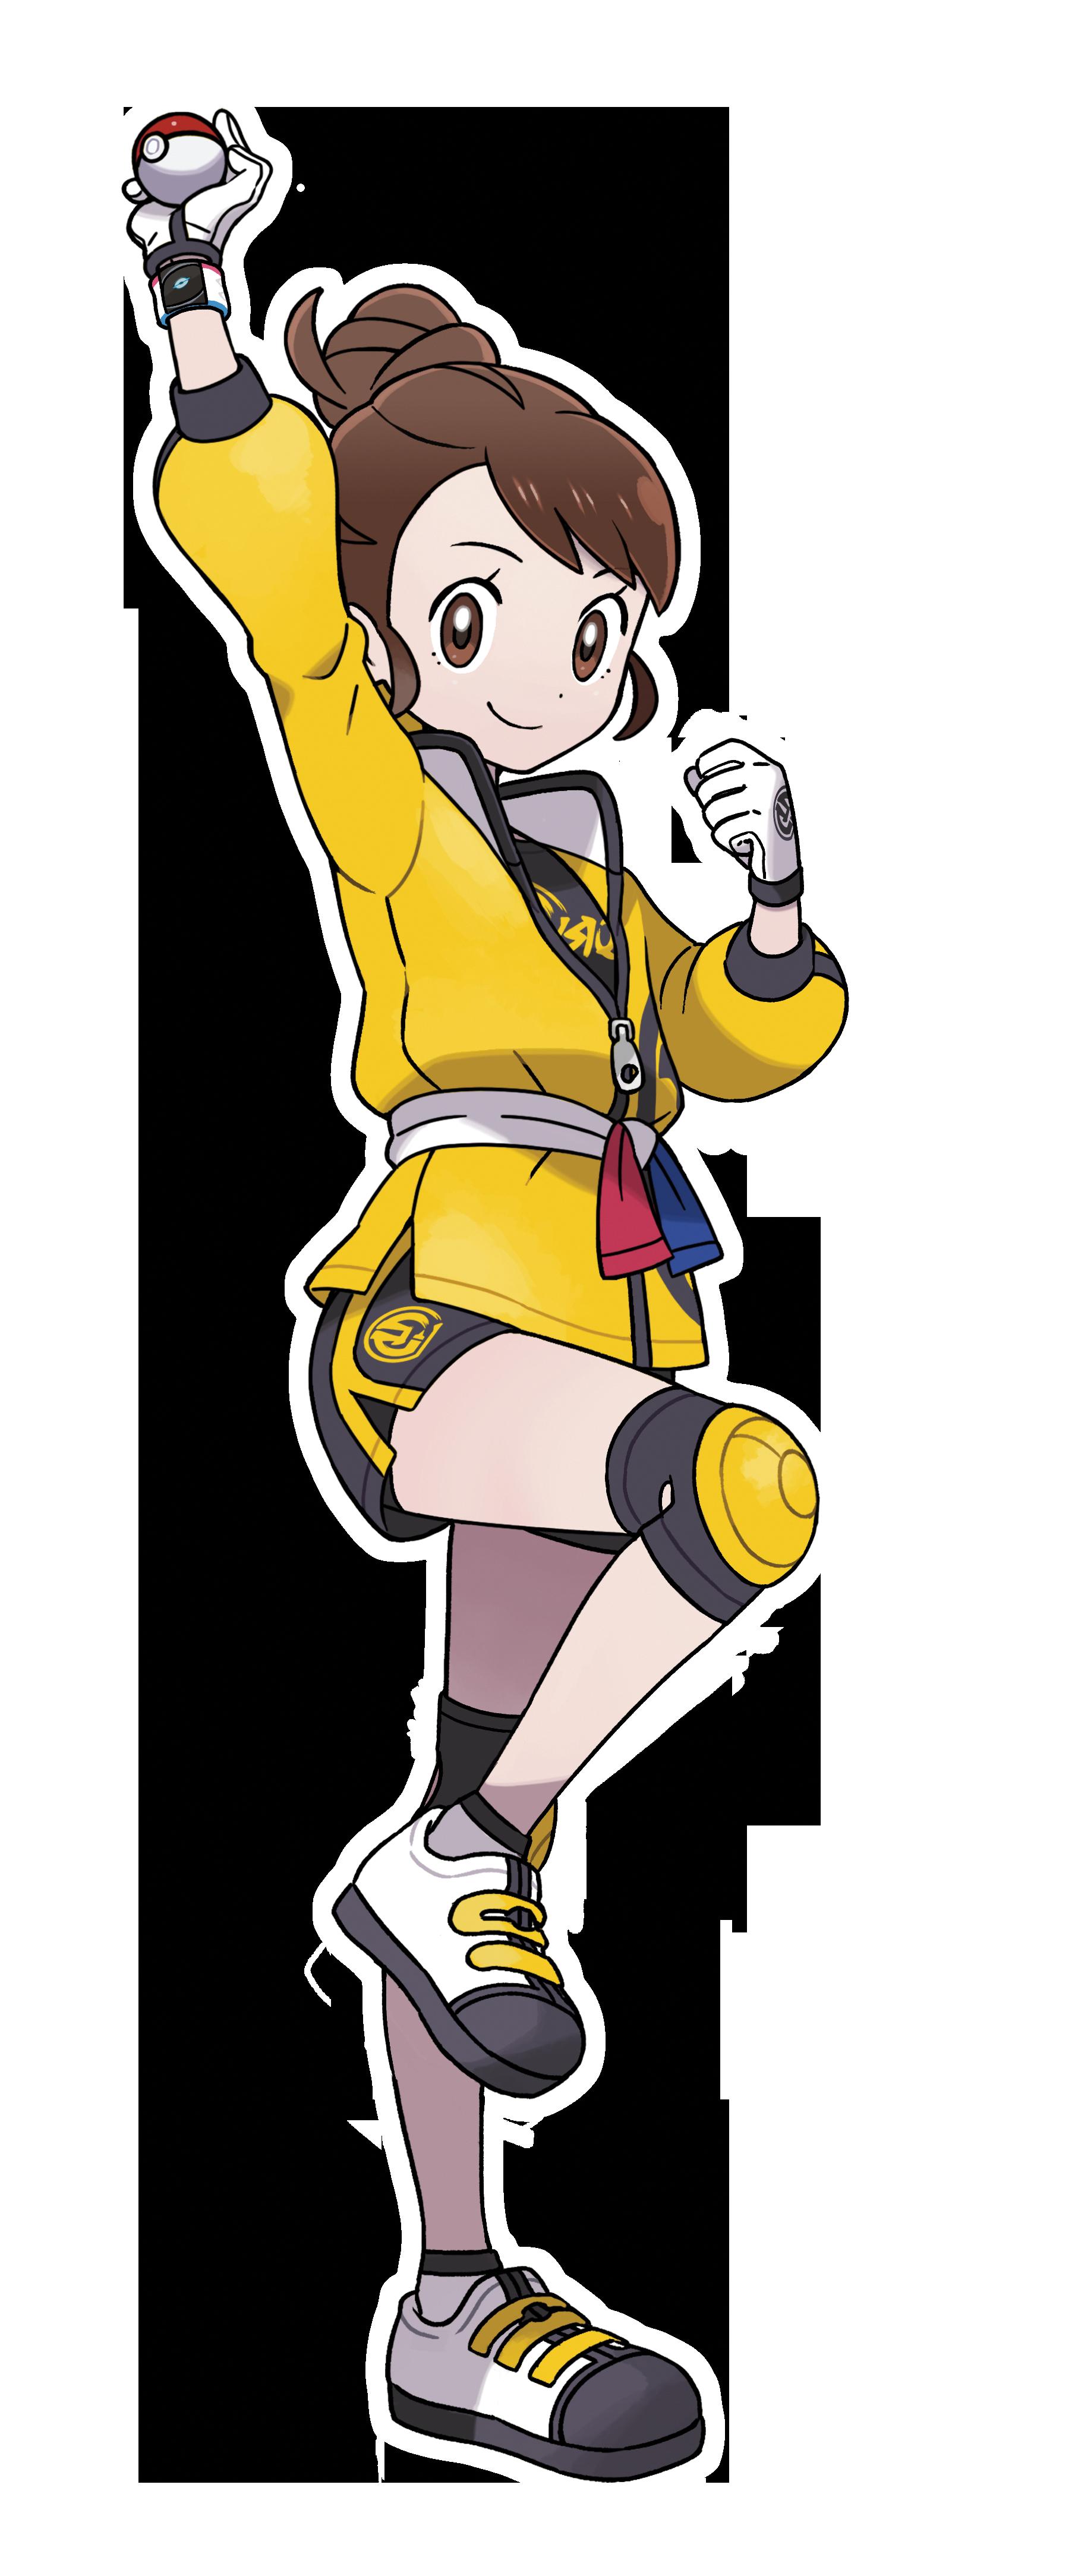 Pokemon-Sword-and-Shield_2020_01-09-20_024